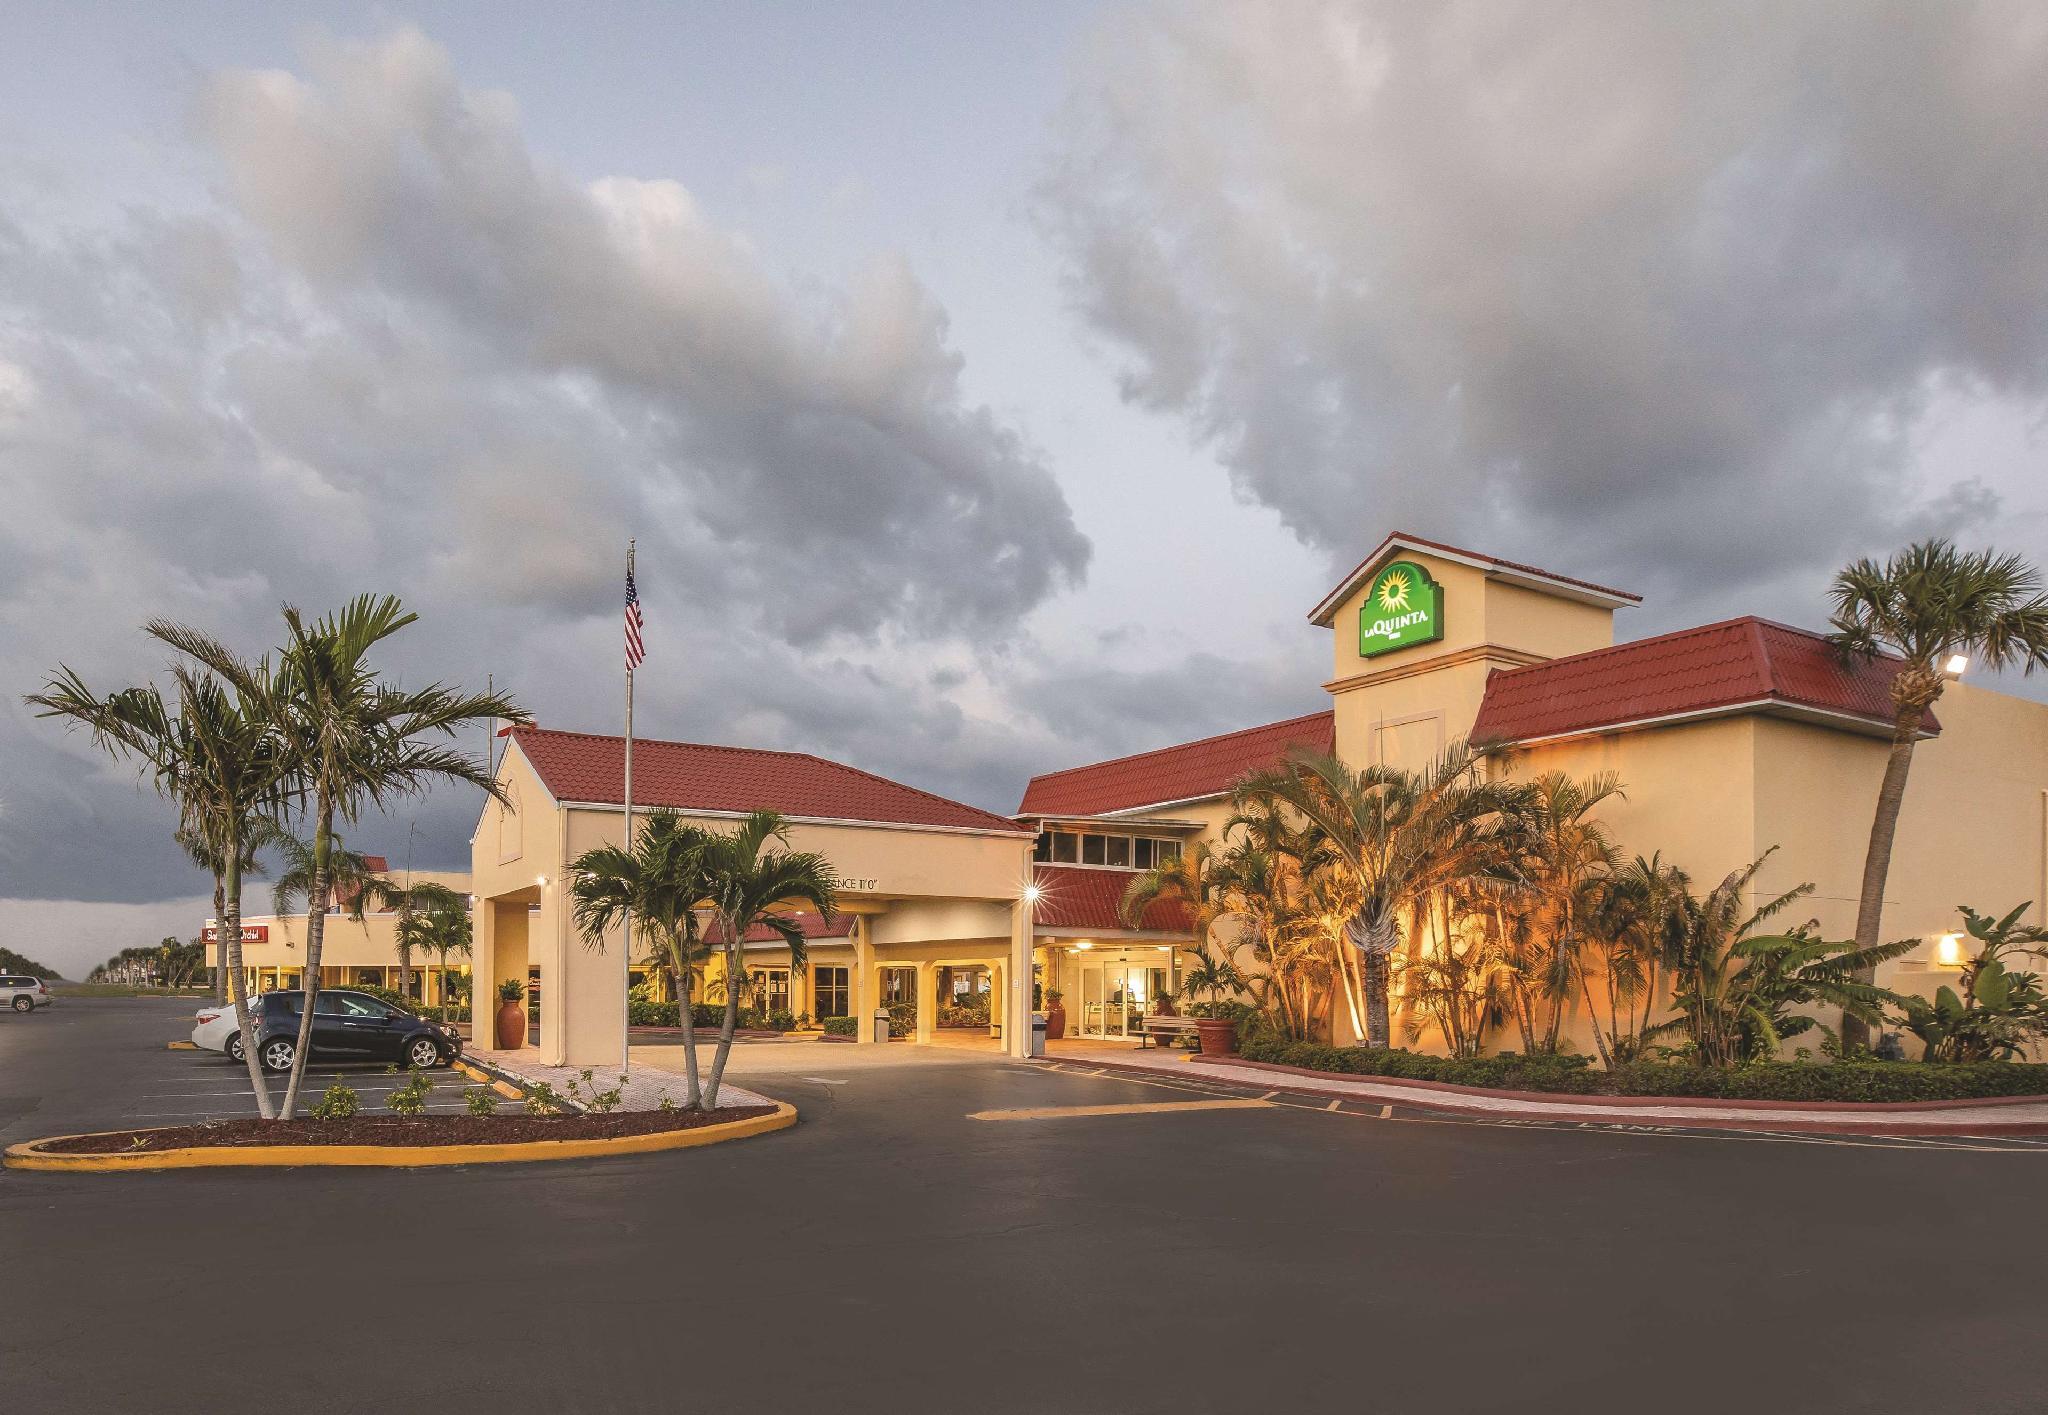 La Quinta Inn By Wyndham Cocoa Beach Port Canaveral